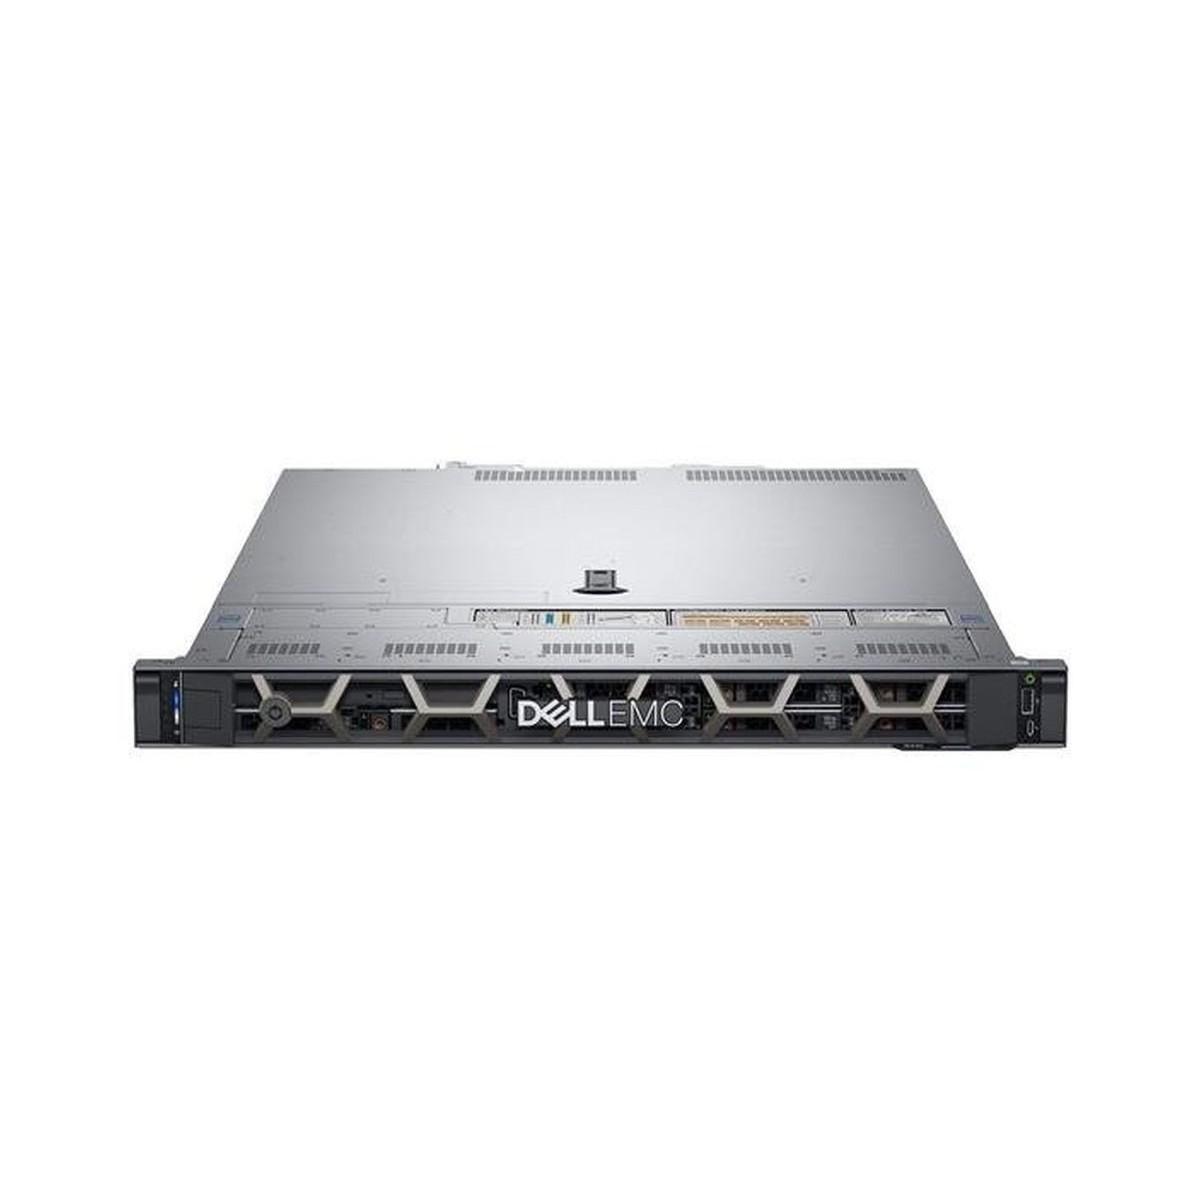 HP SMART ARRAY P410 512MB 6GB/s 462919-001